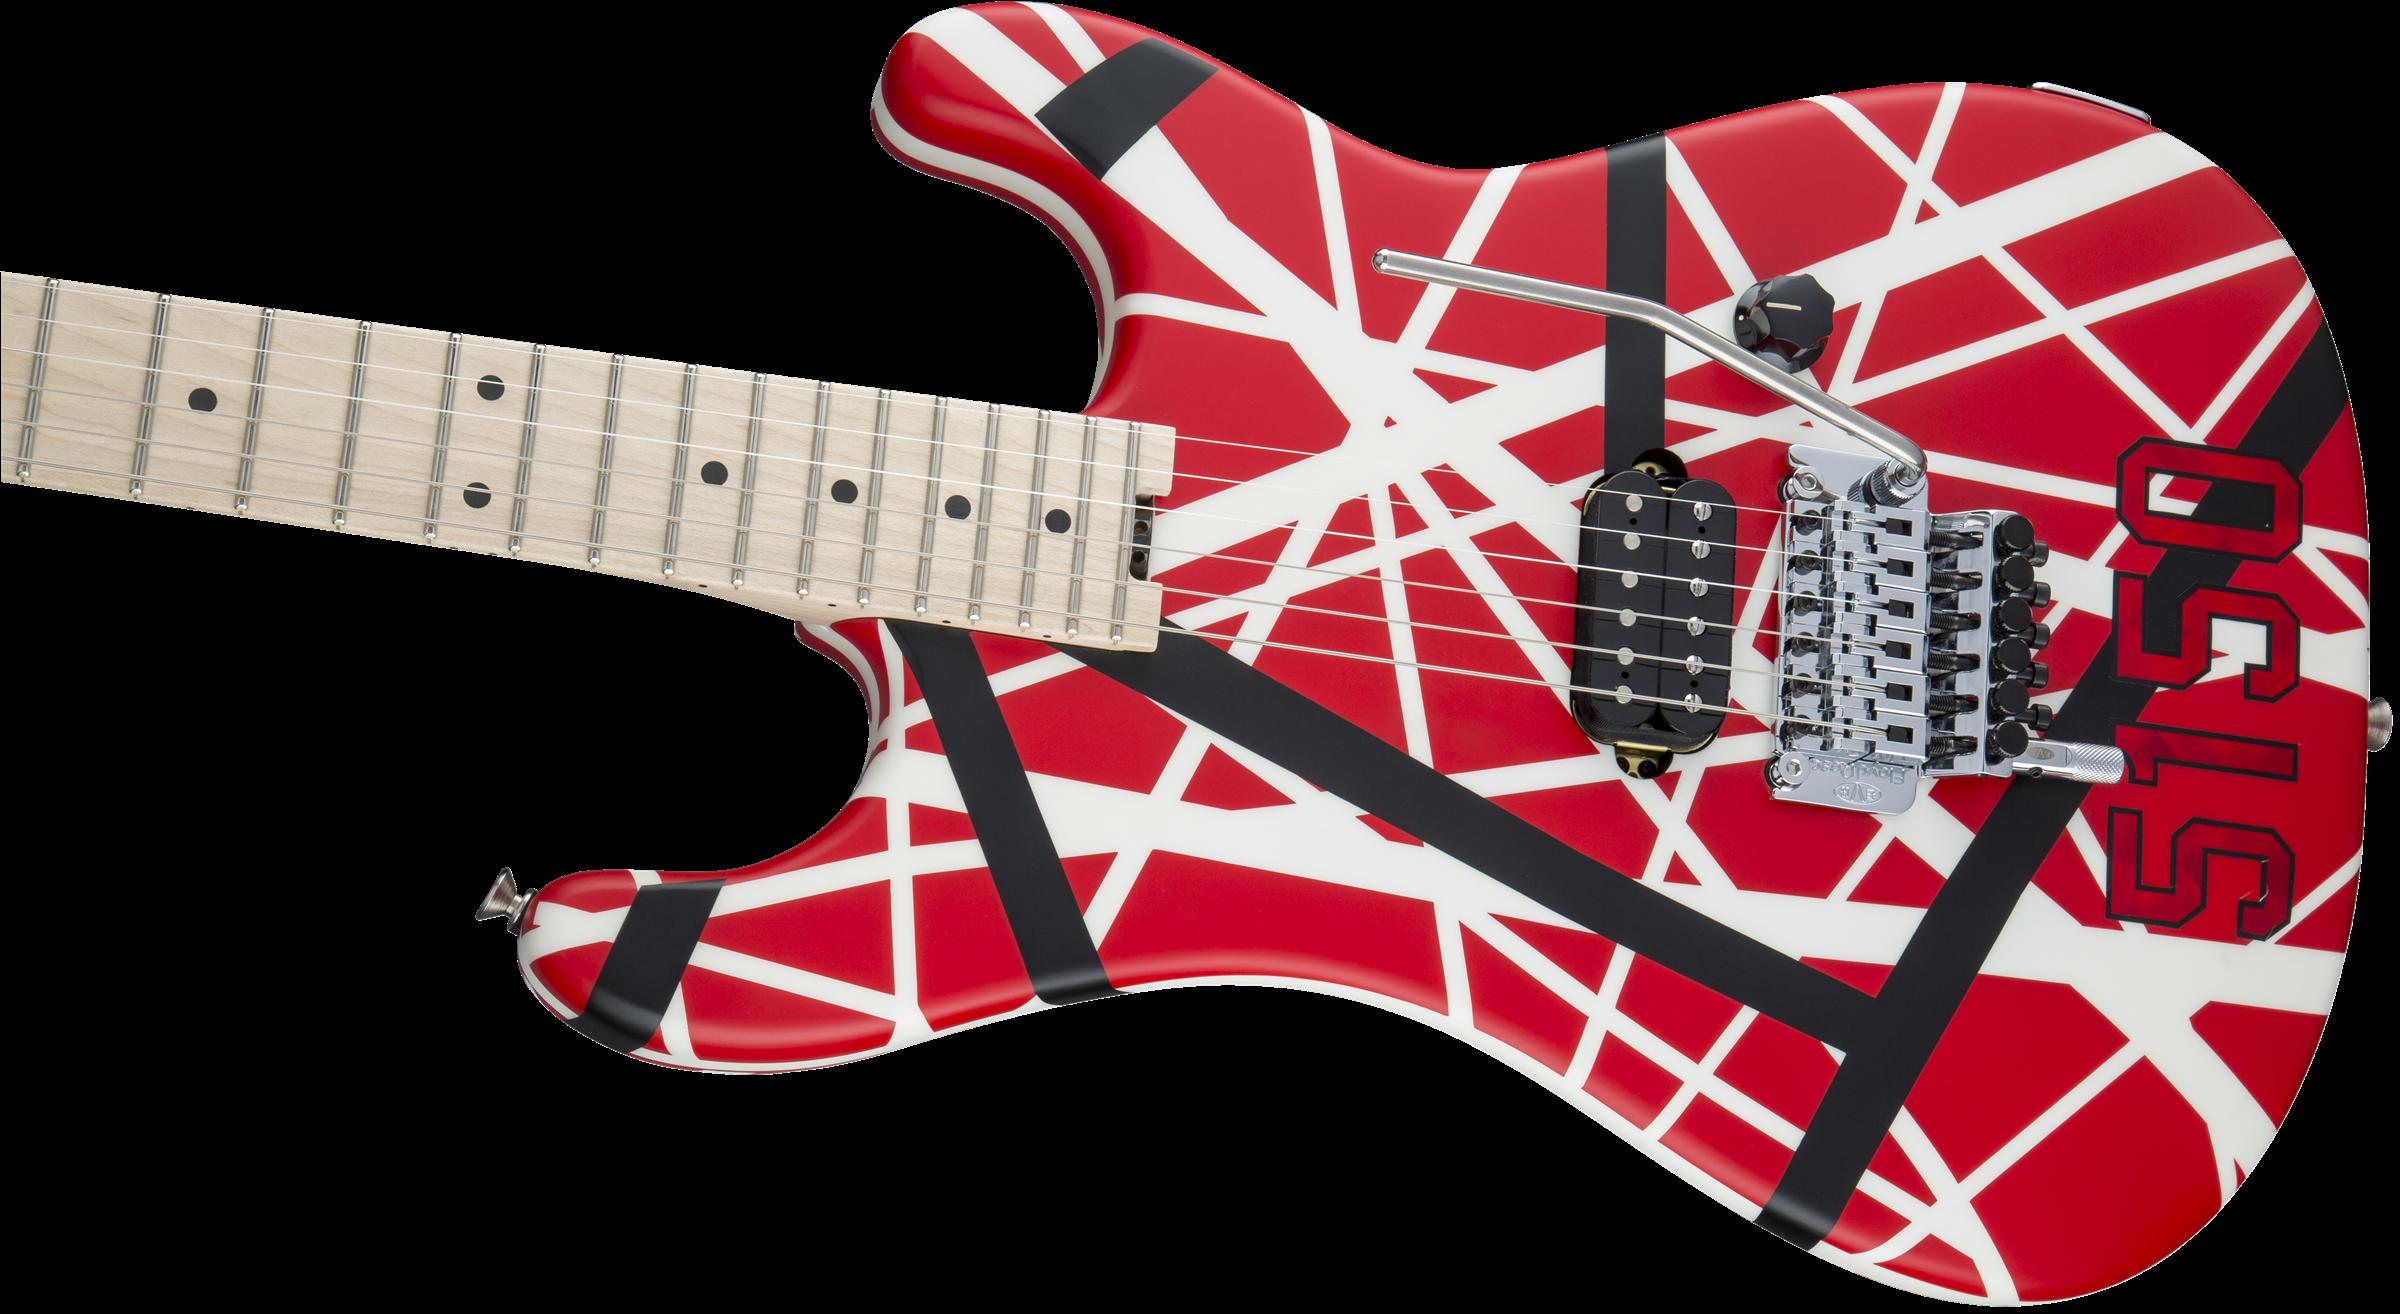 57dd8f62225 EVH® Striped Series 5150®